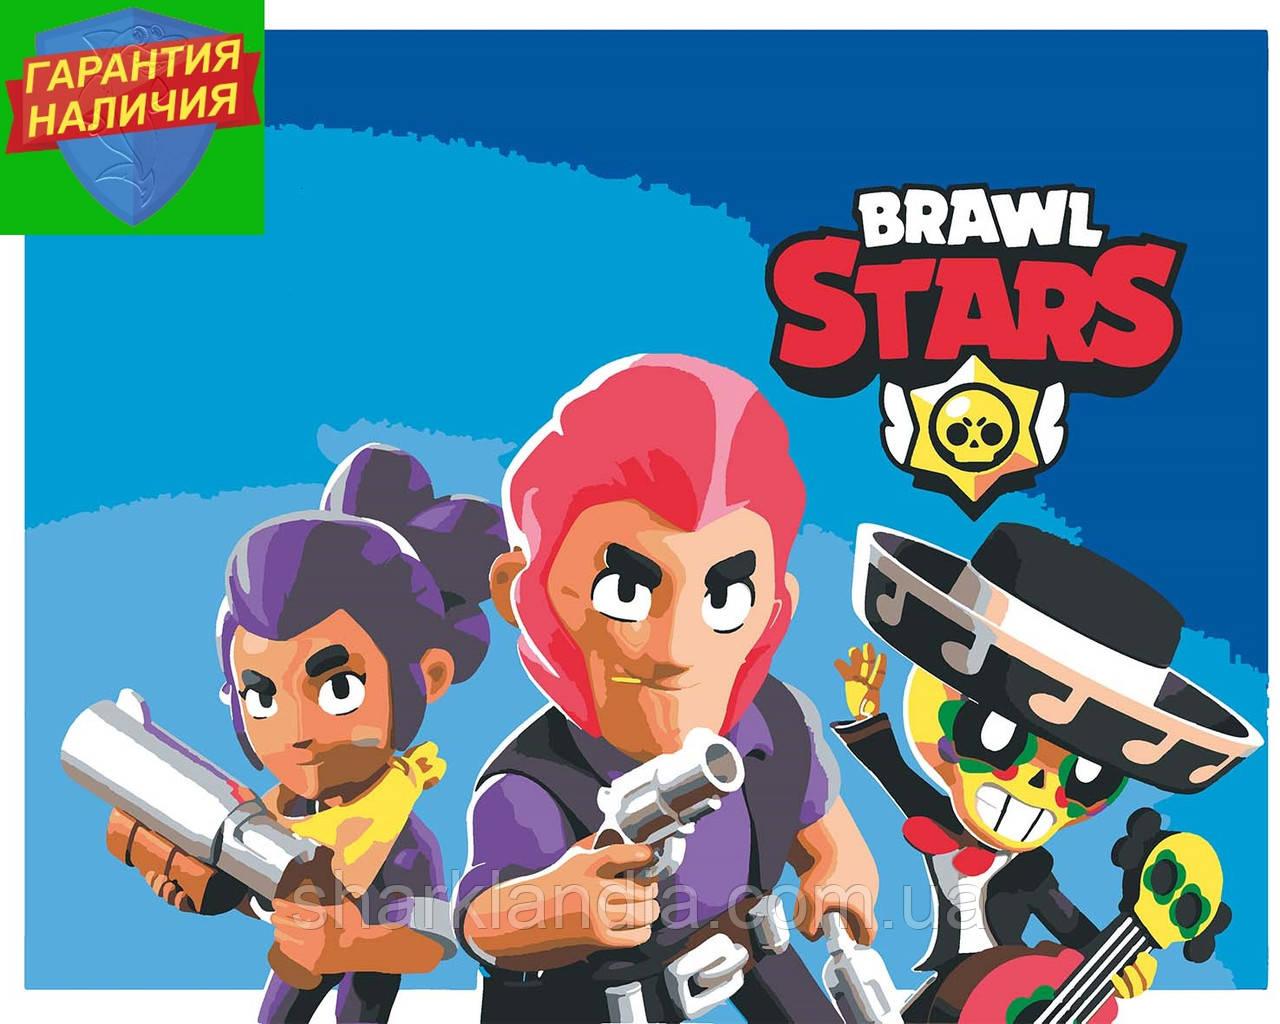 Картина по номерам Brawl Stars Бравл Старс 2 (цветной холст) 40*50см Барви Раскраска по цифрам